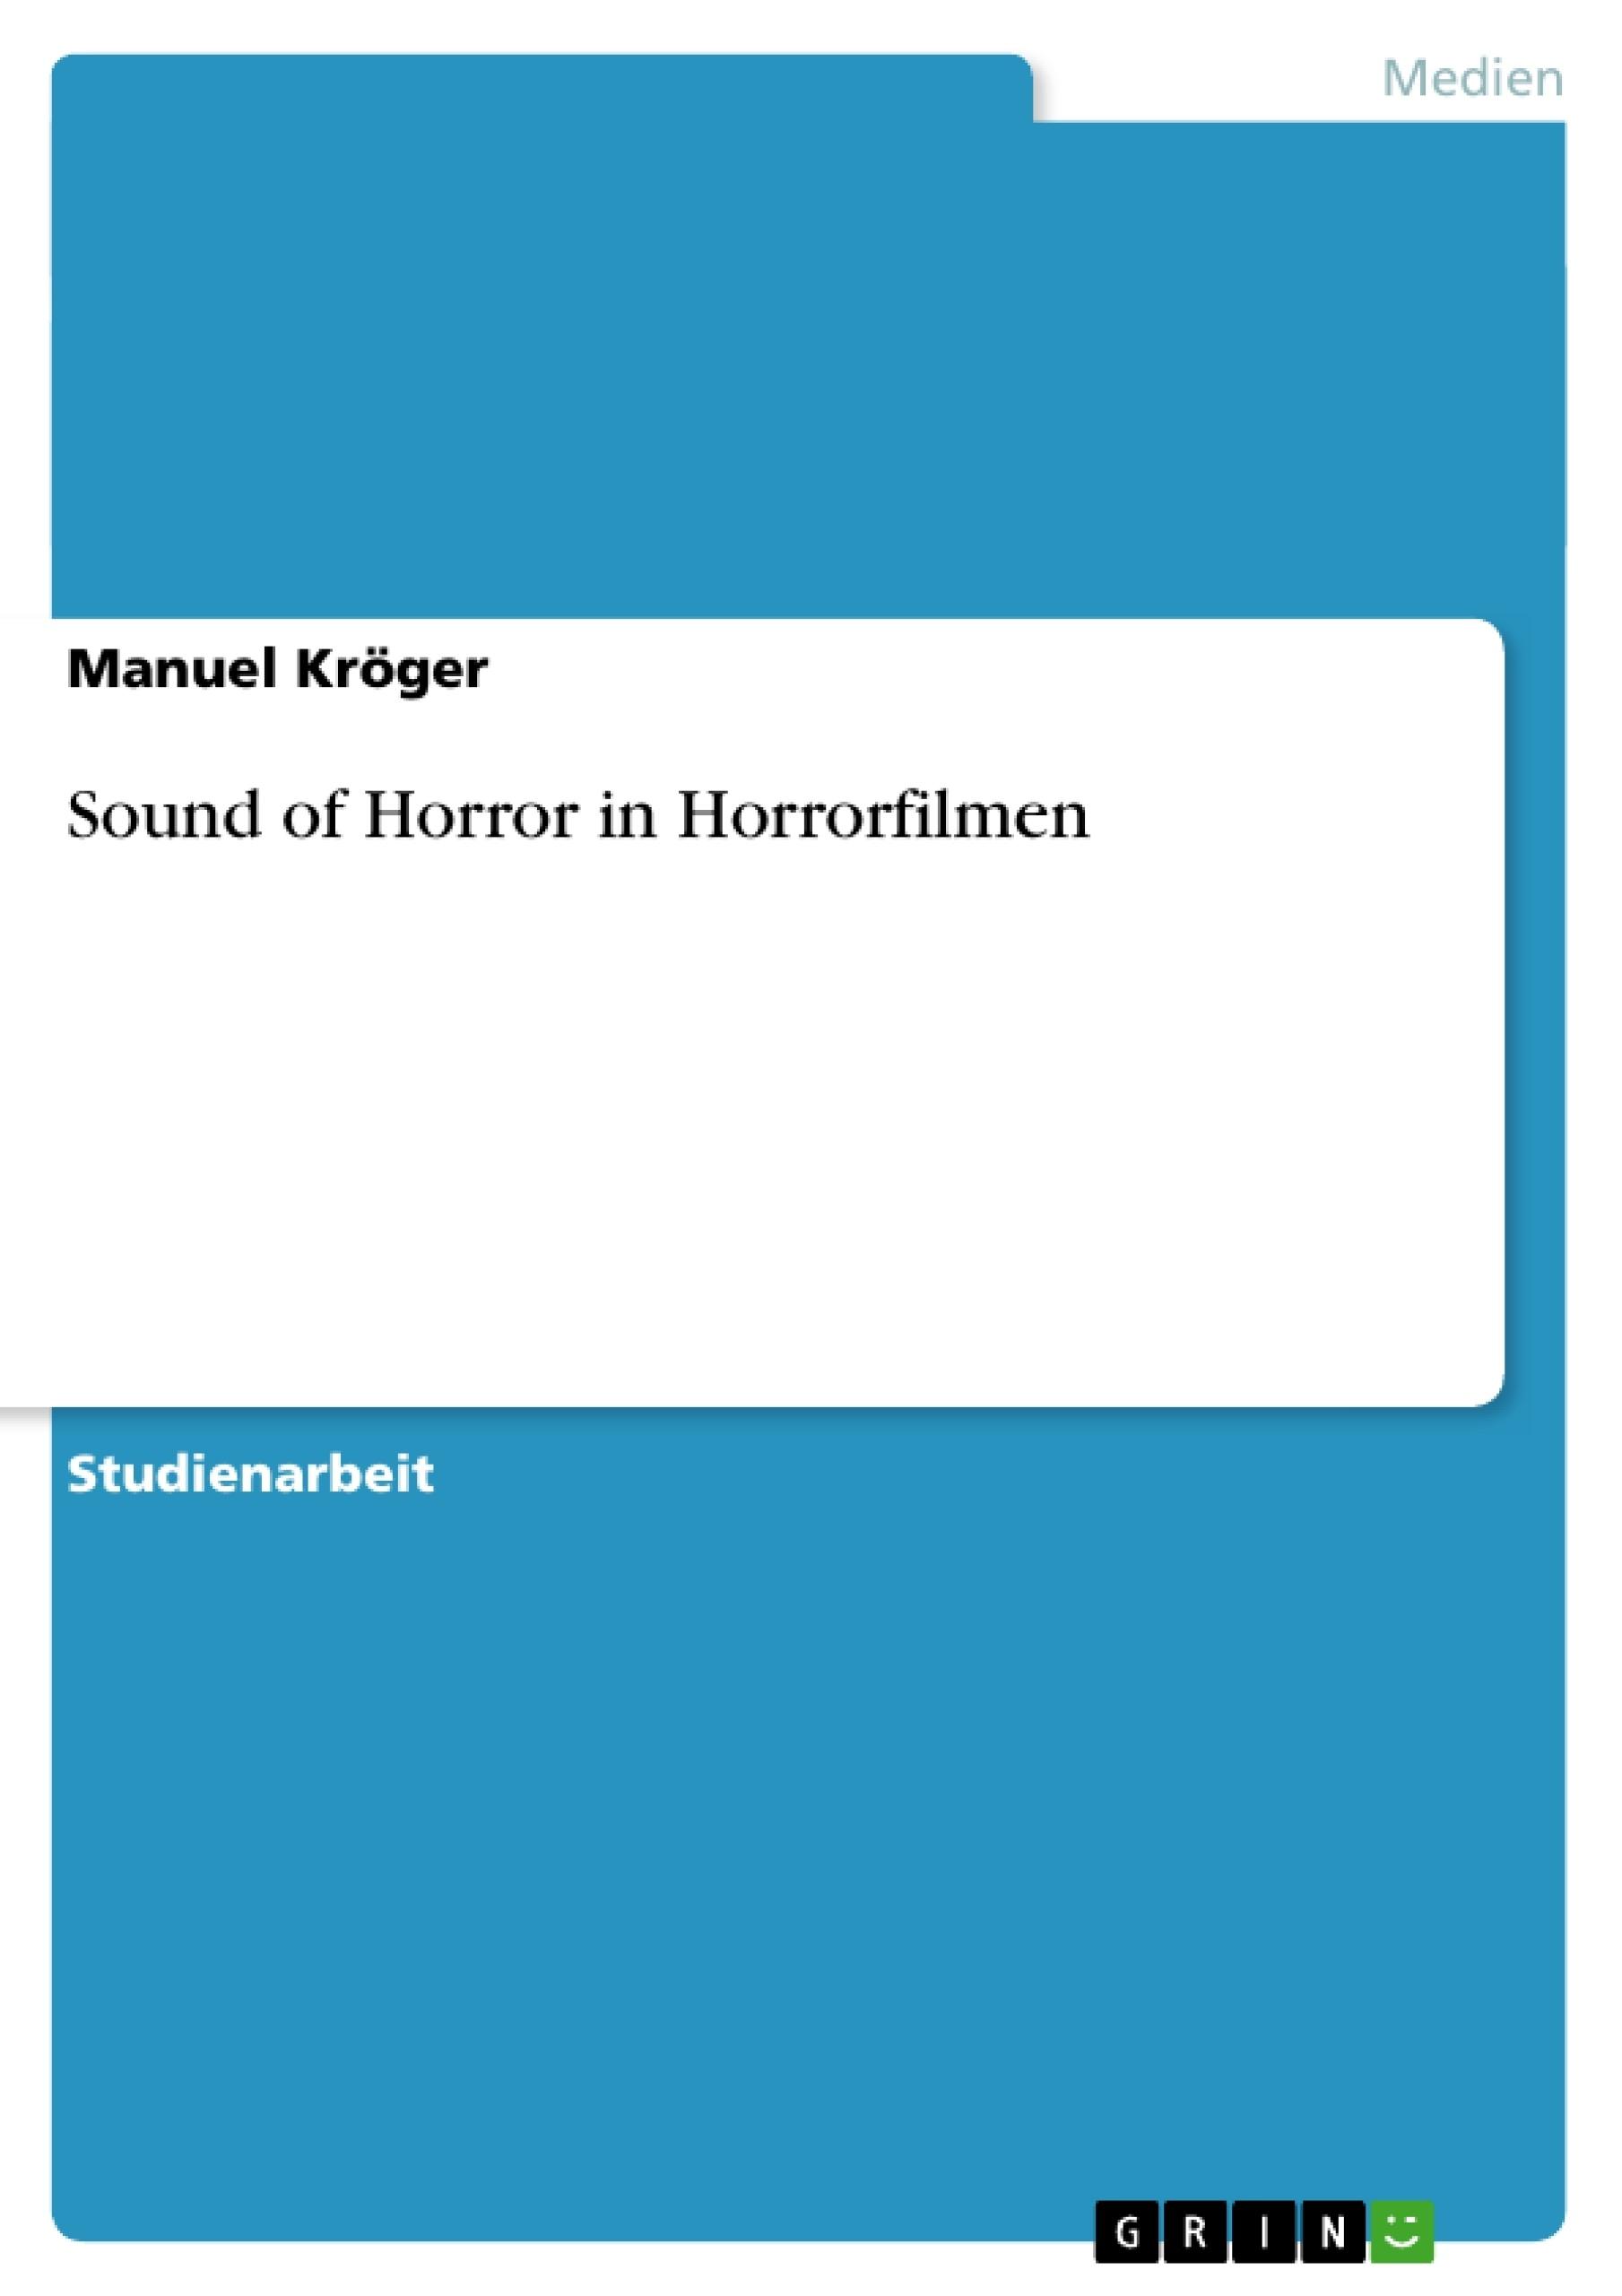 Titel: Sound of Horror in Horrorfilmen